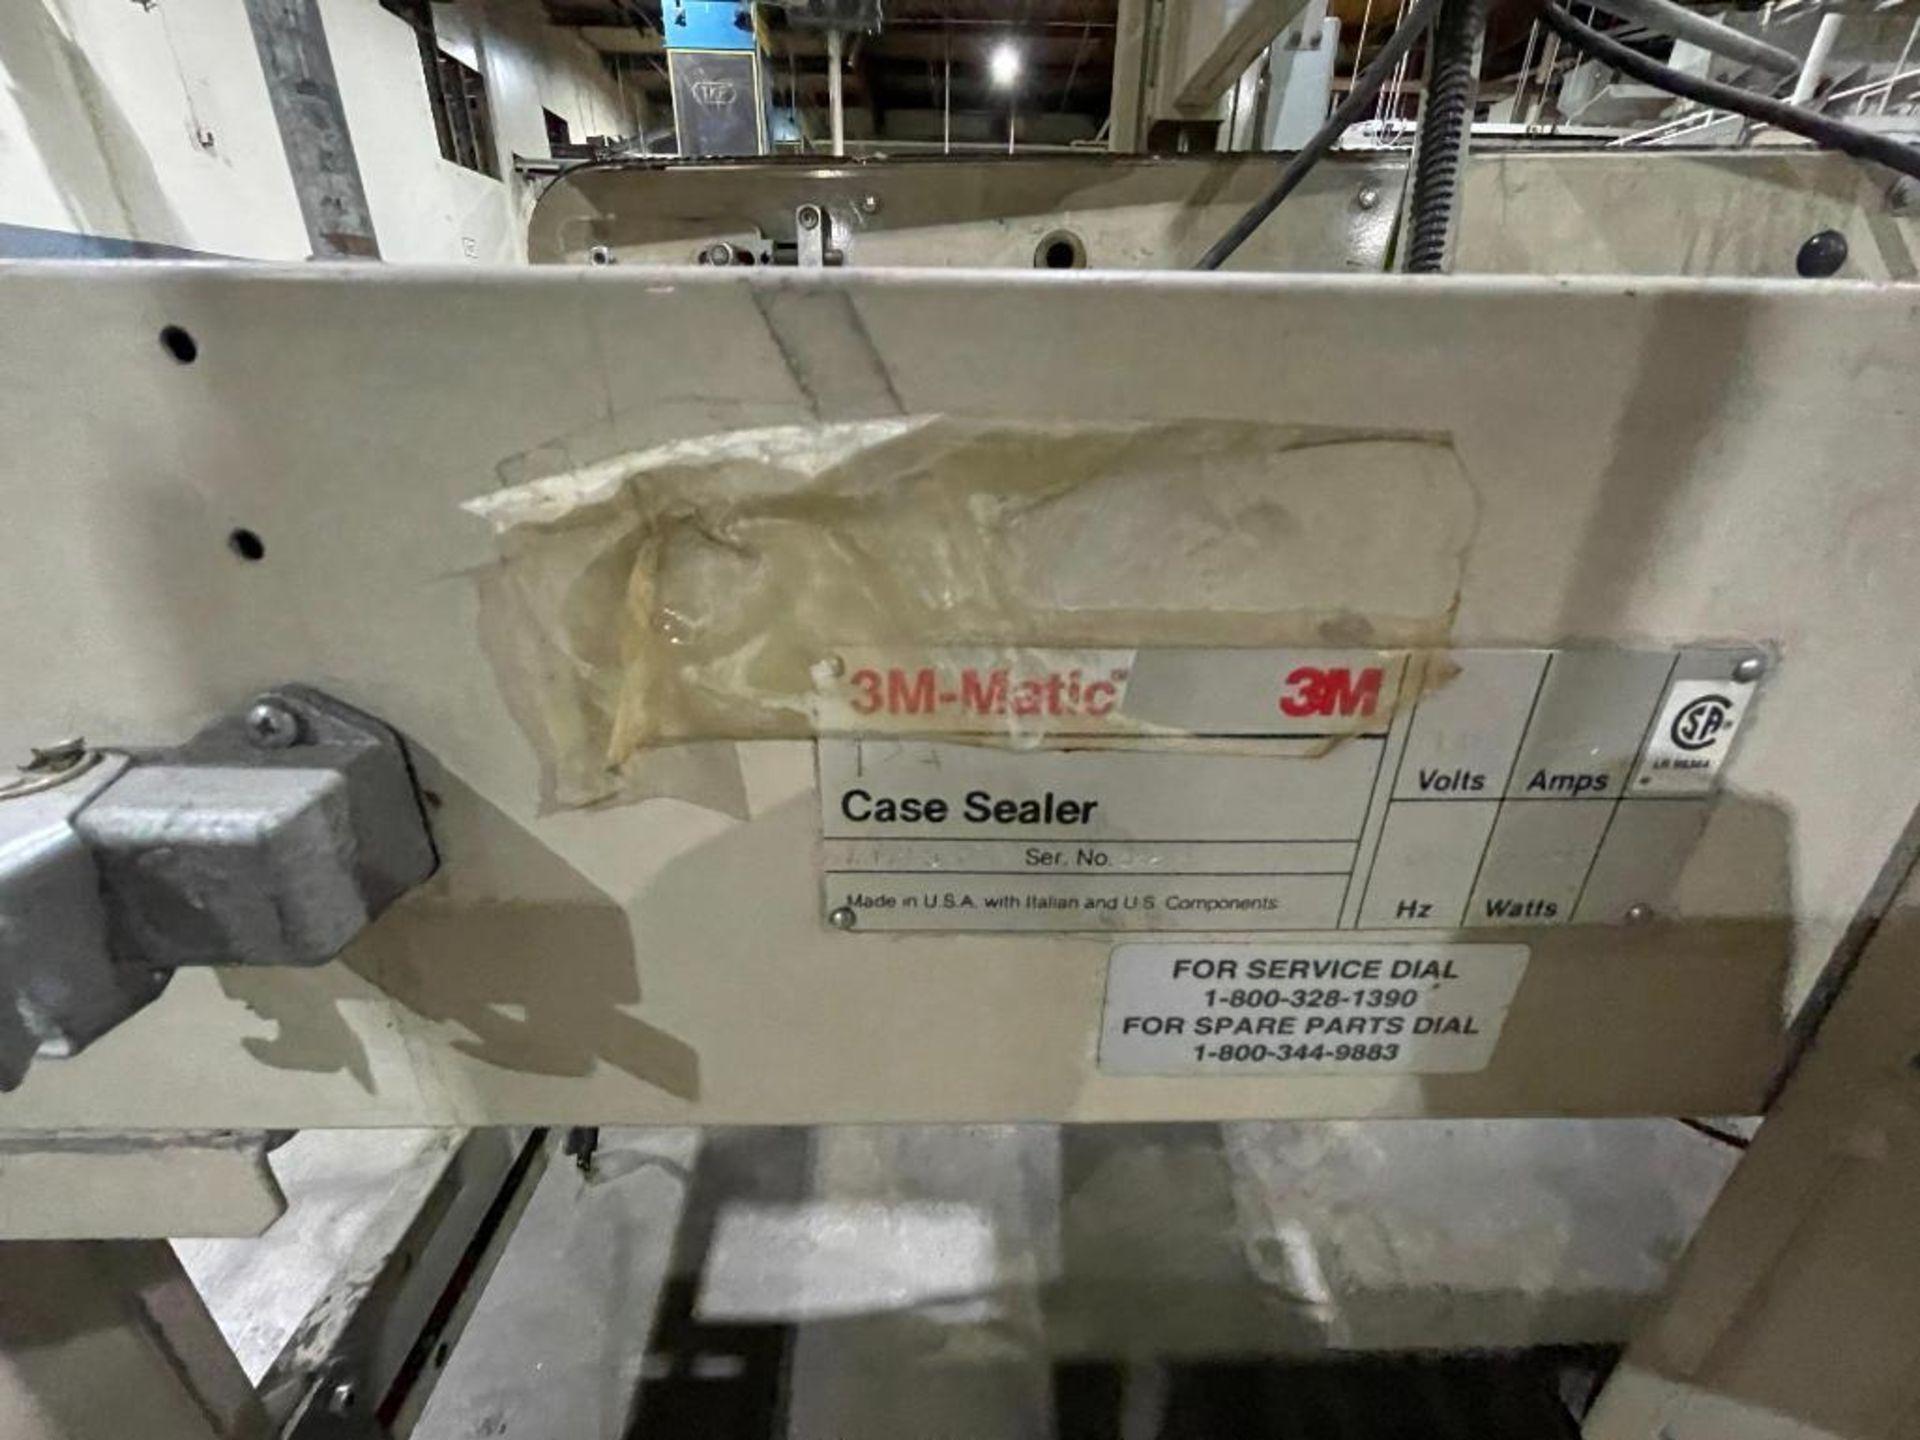 (3) 3M-Matic case taper parts - Image 21 of 23